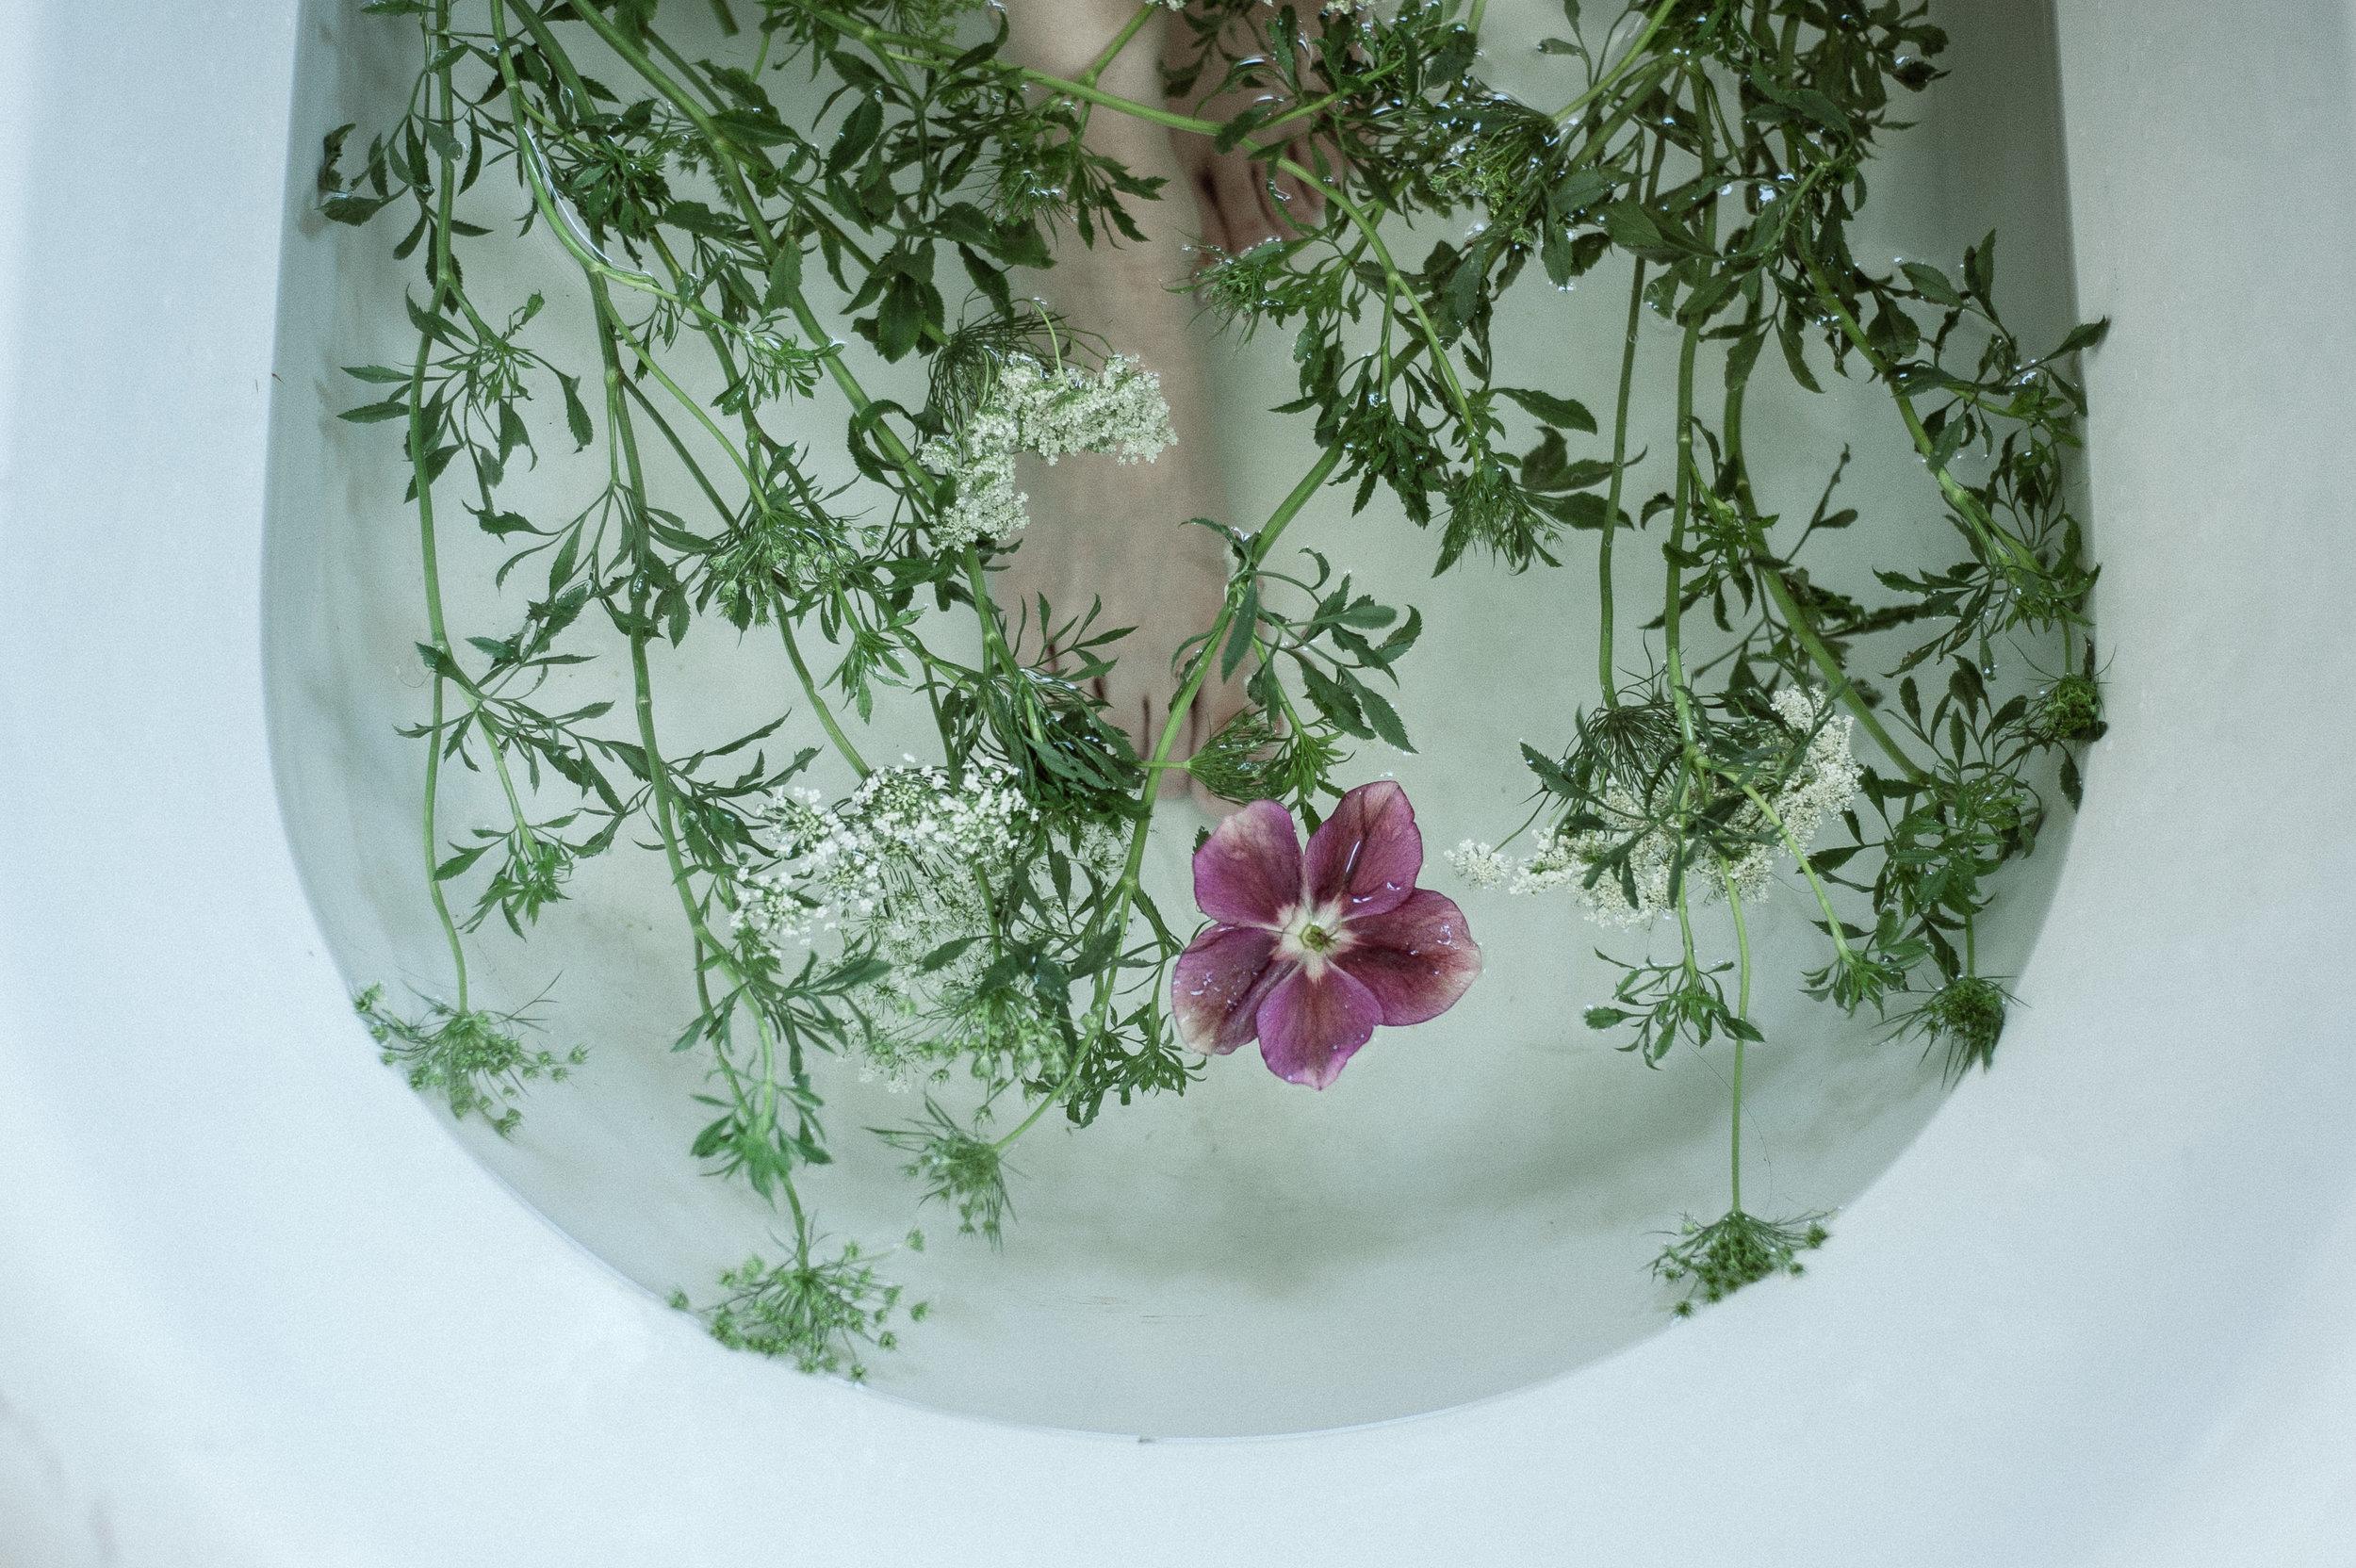 fern + floret botanical co - twin cities, mn wedding and event florist - wedding floral design - minneapolis minnesota - st paul - saint paul - mpls - wedding florist - studio apparatus st. paul mn